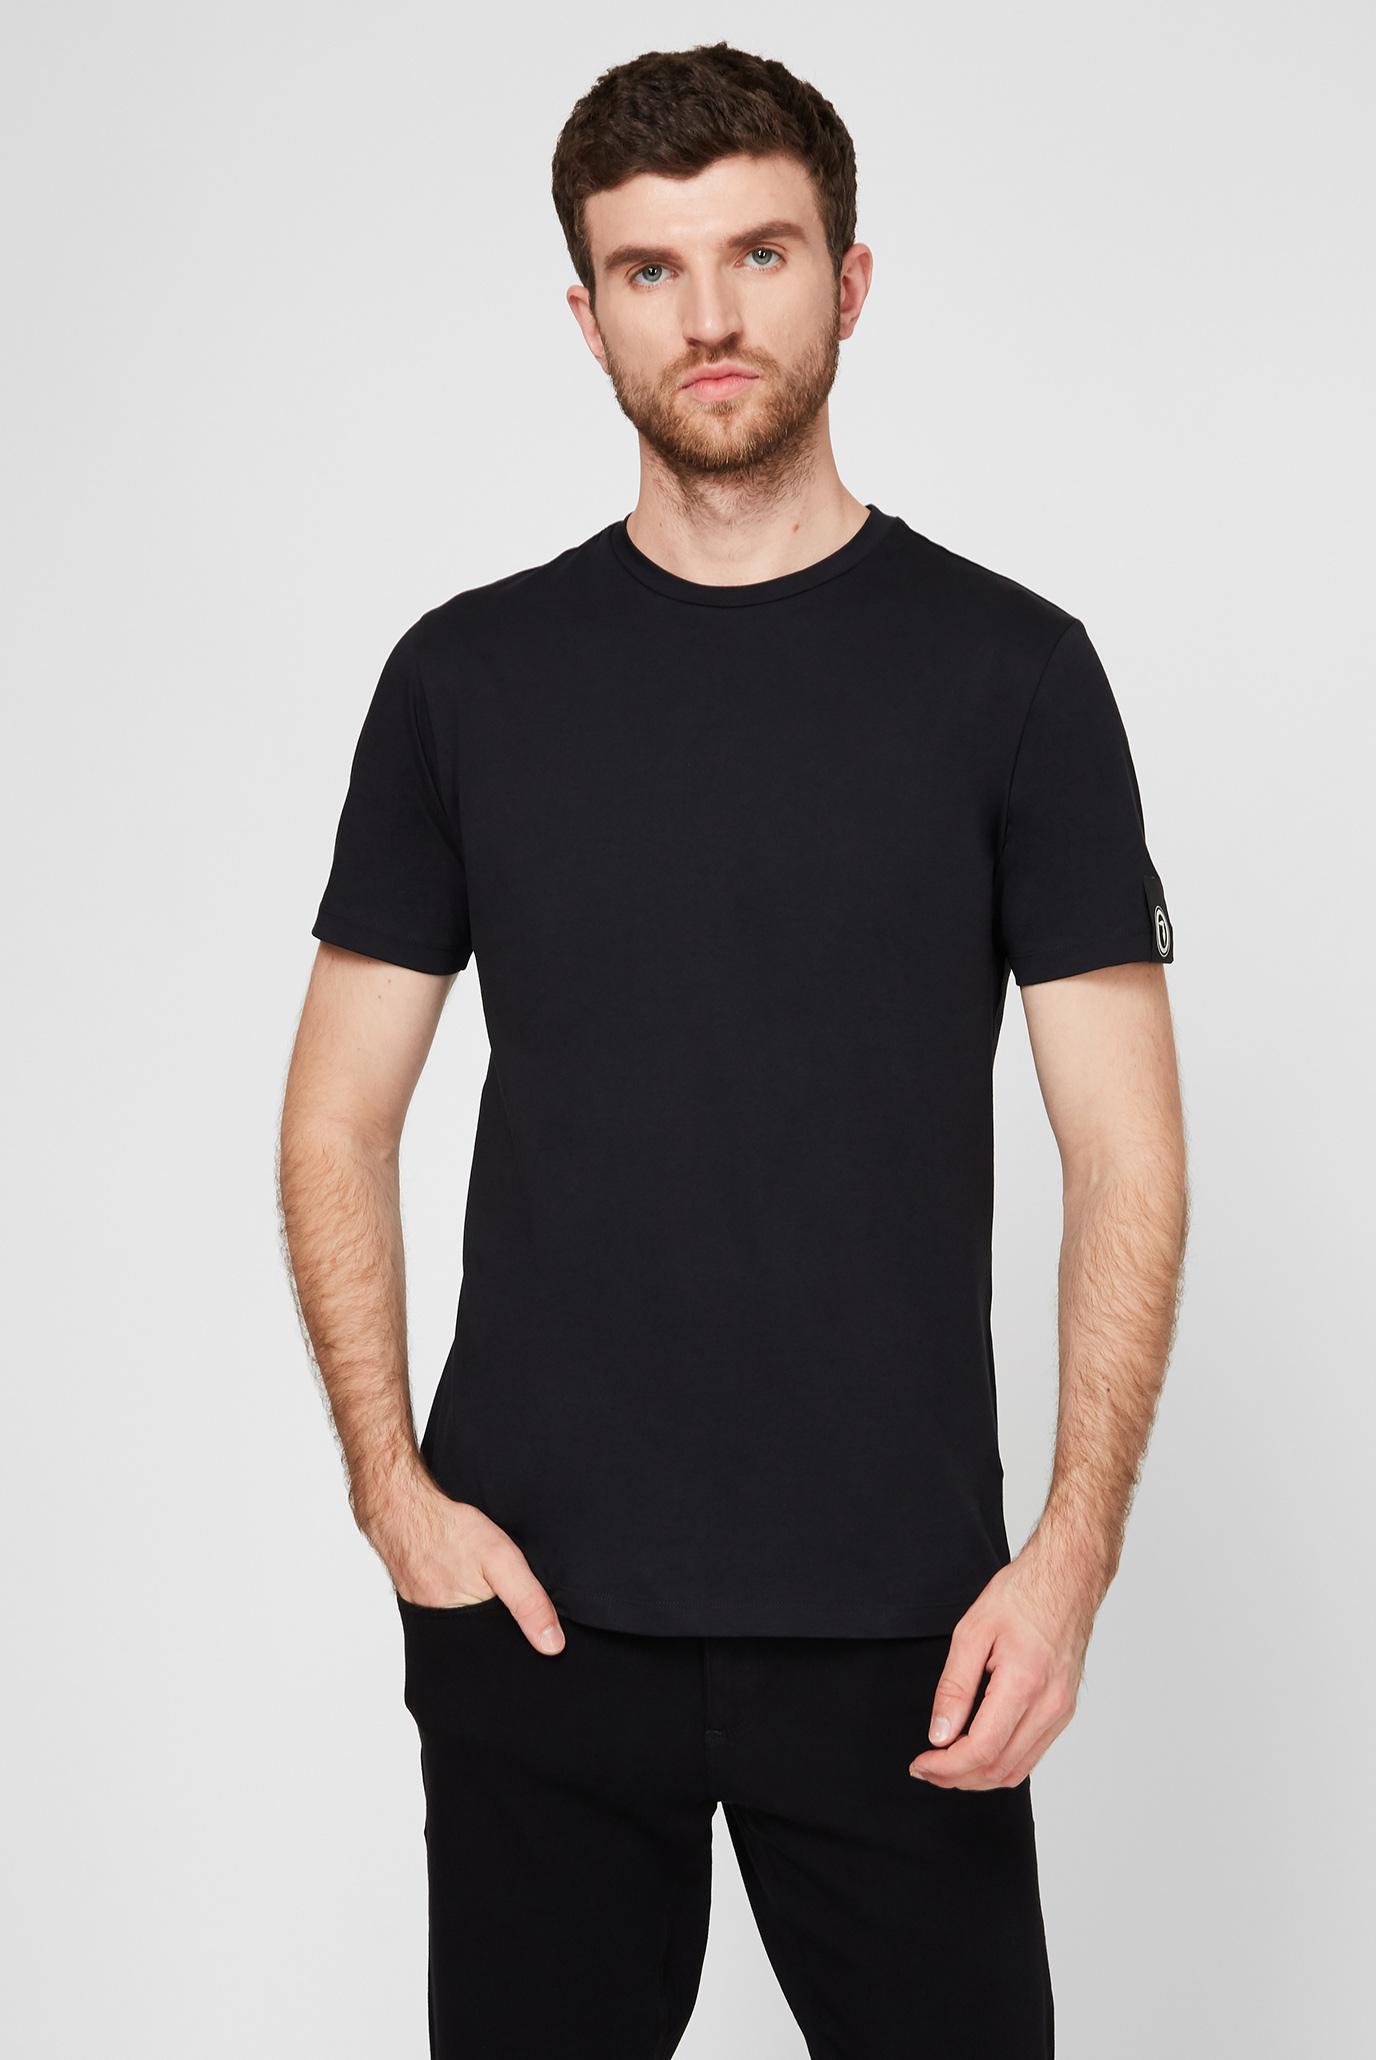 Чоловіча чорна футболка з принтом REGULAR FIT Trussardi Jeans